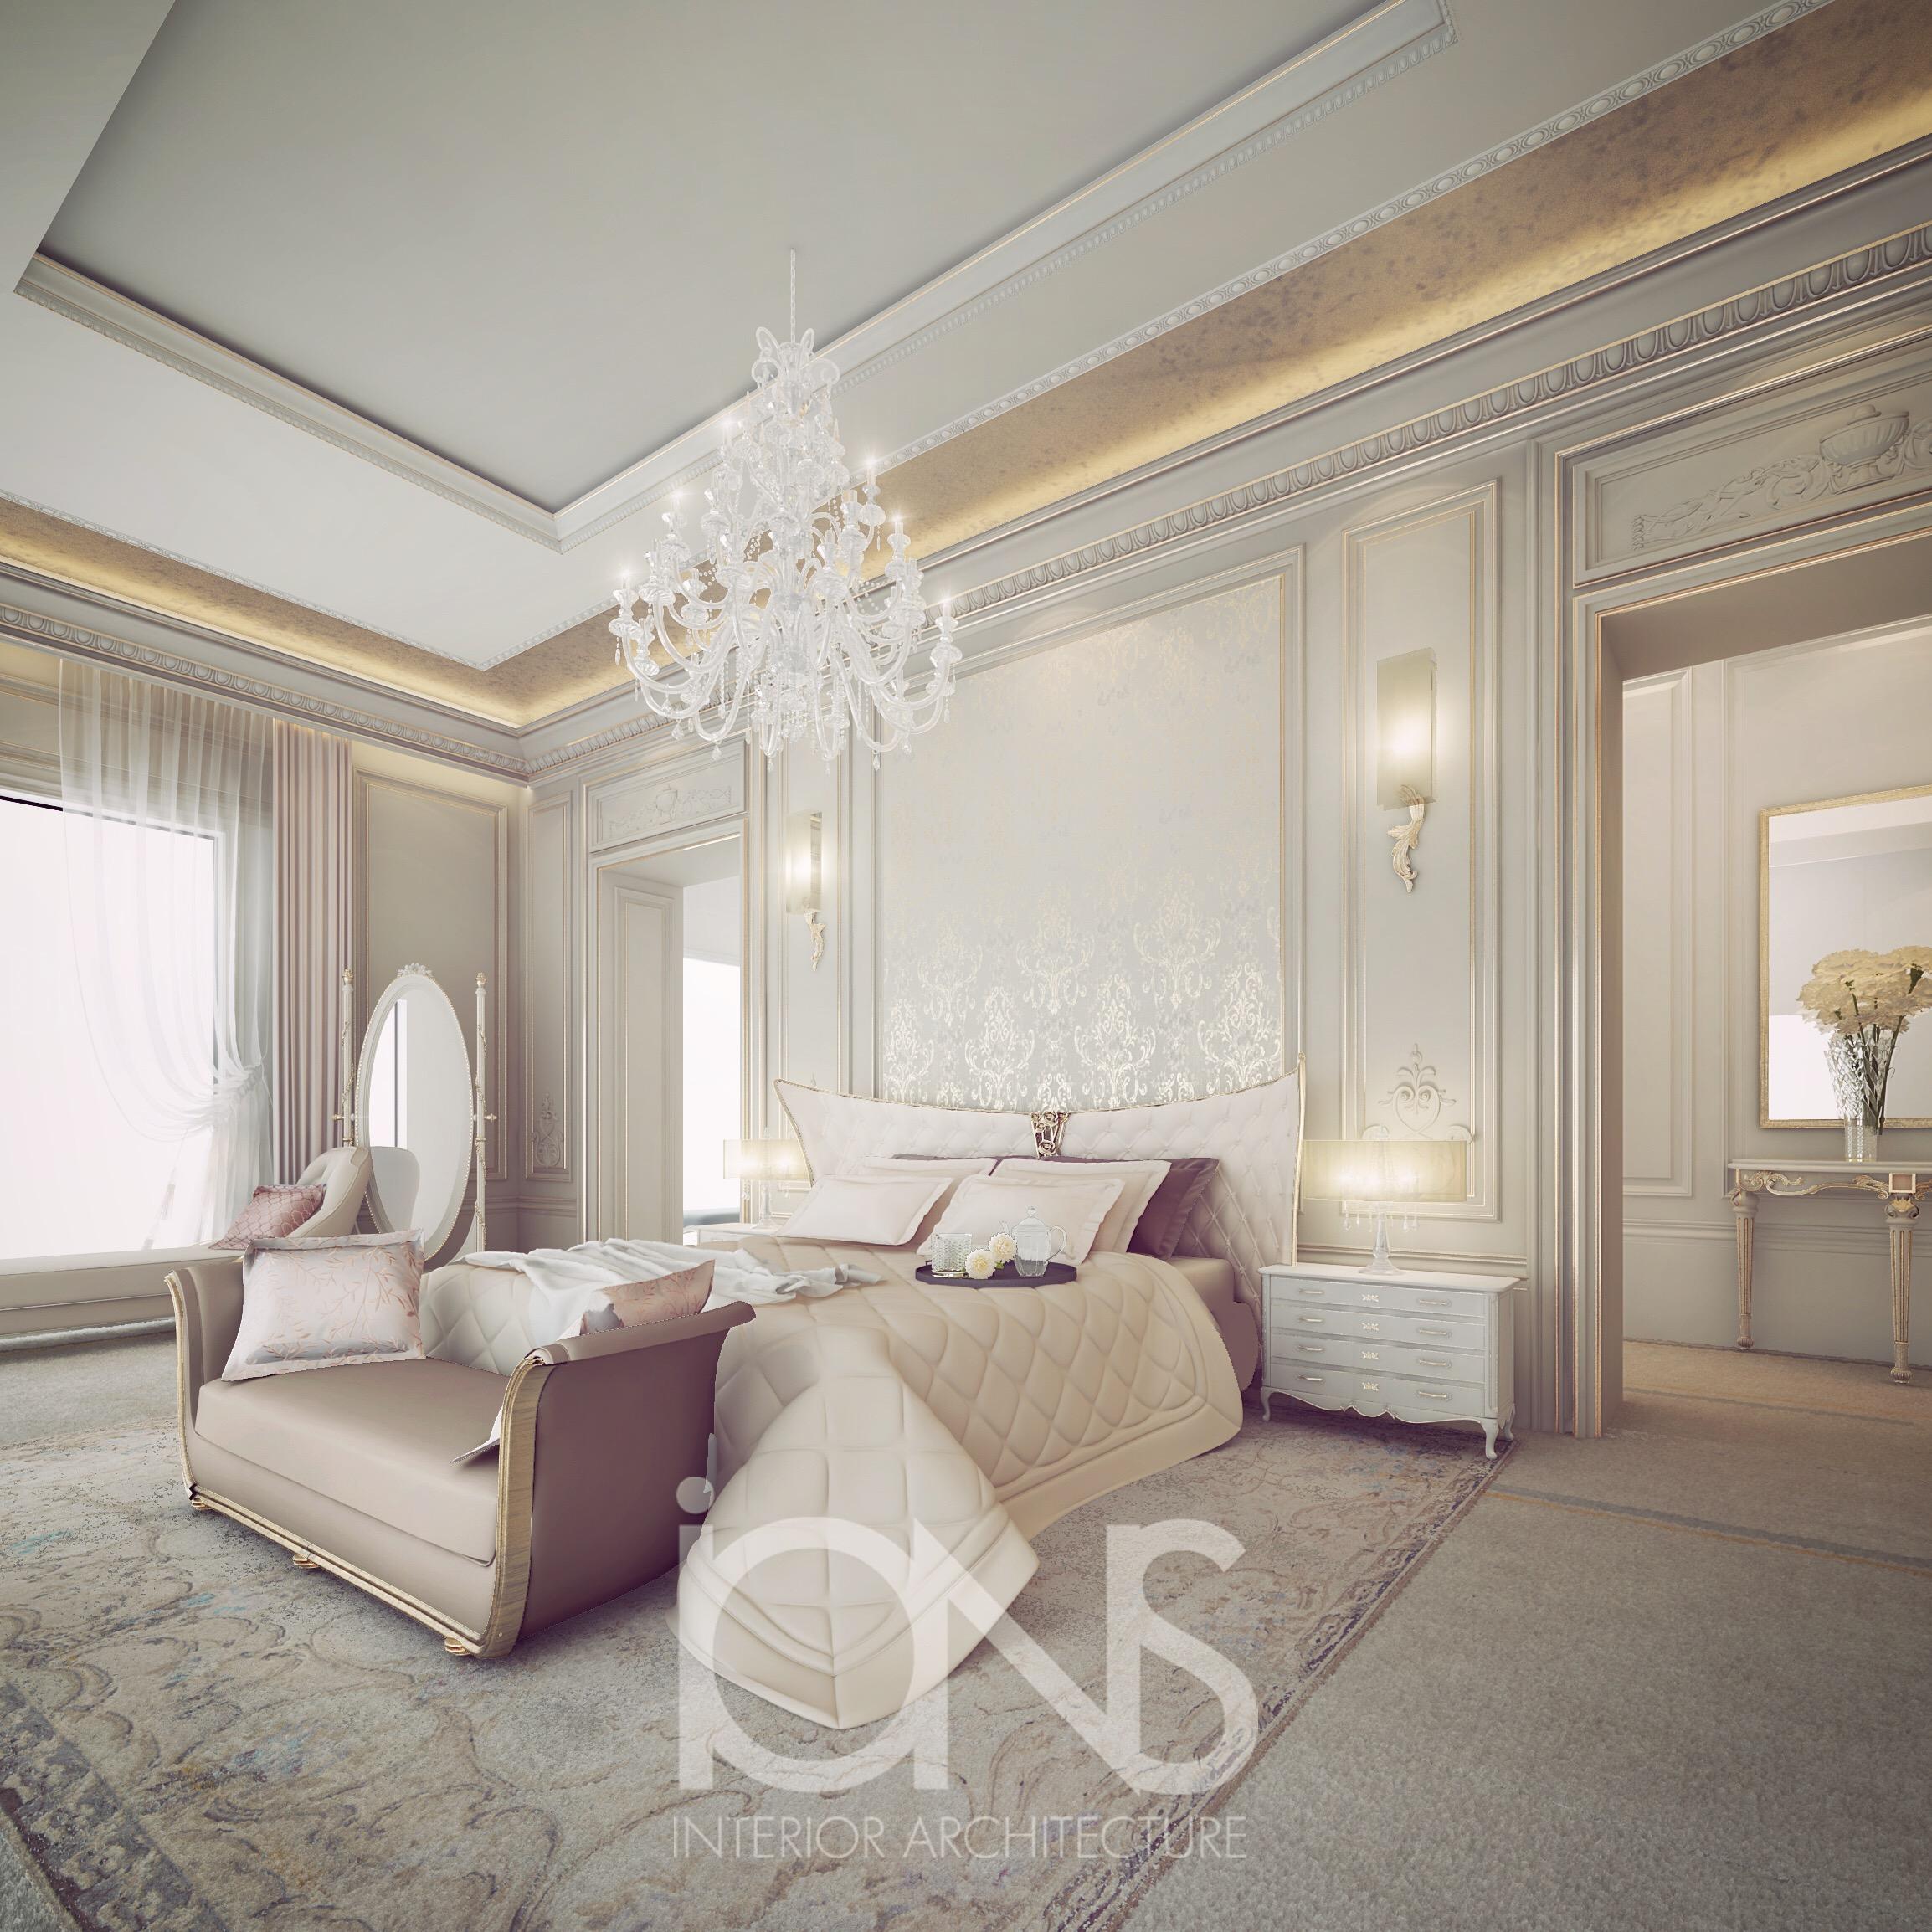 Stylish Bedroom Interior Ideas